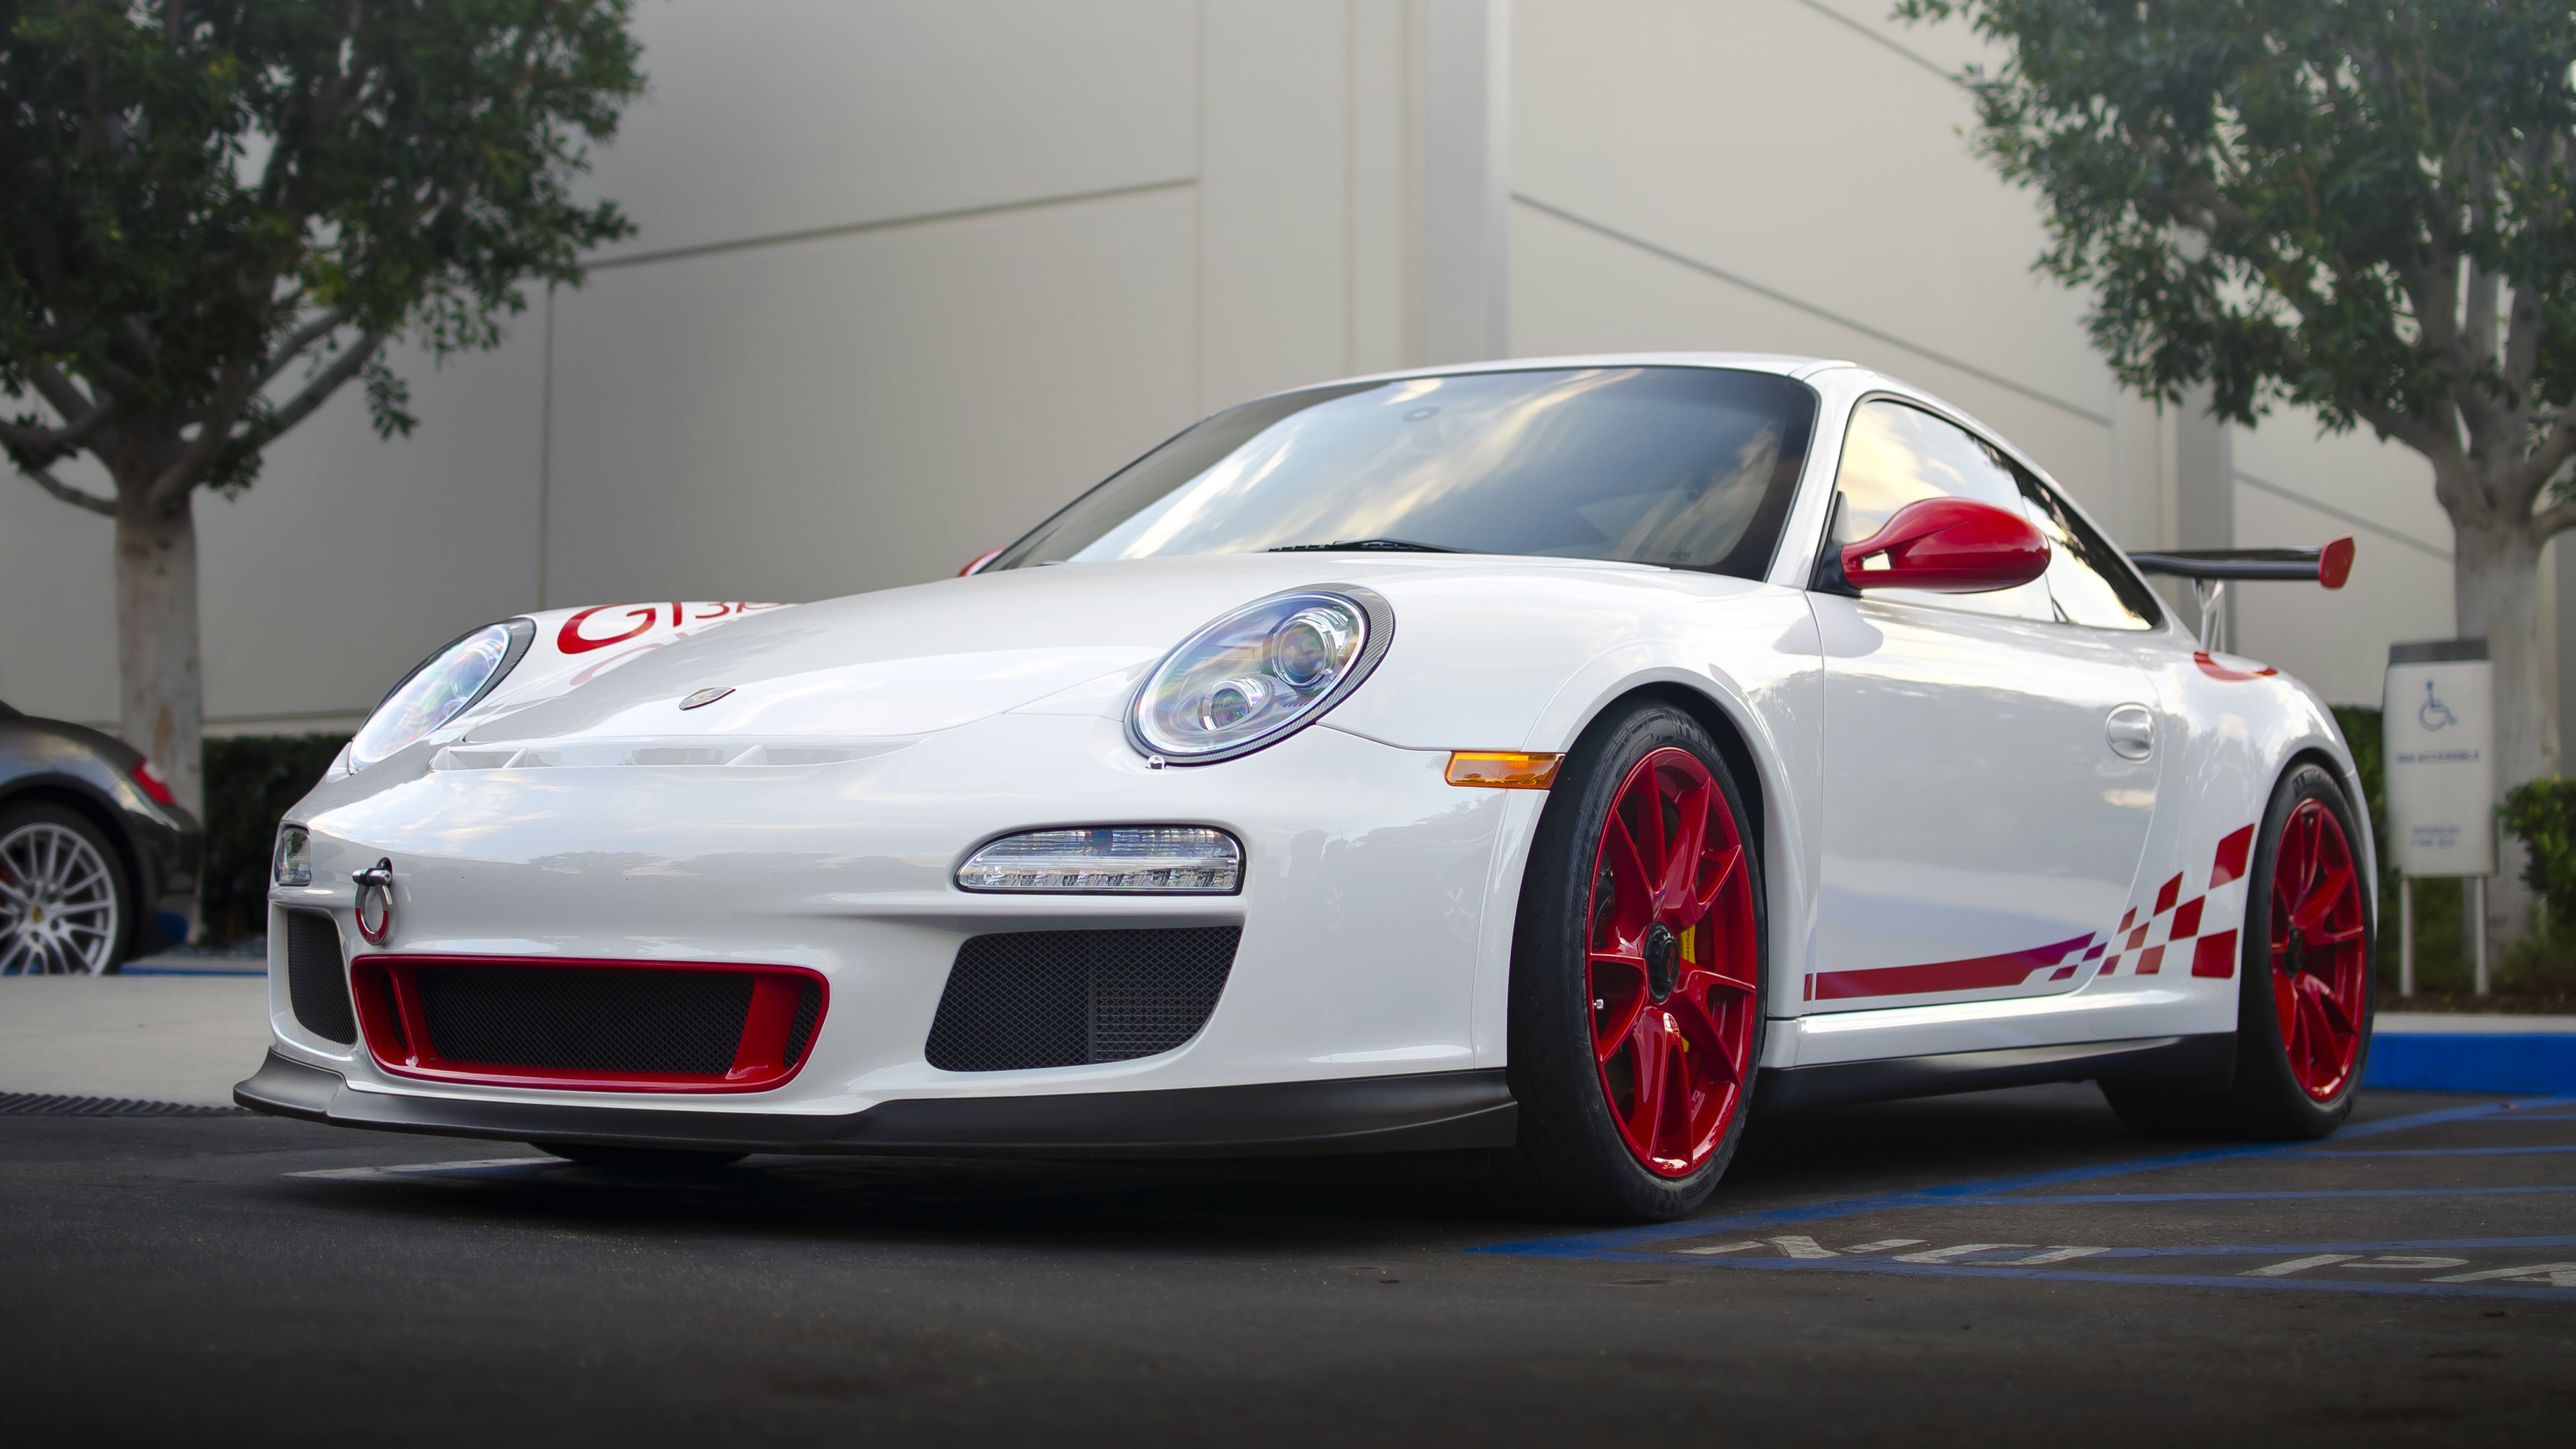 4k Porche Carrera Gt Wallpaper: Porsche 911 Wallpapers, Pictures, Images